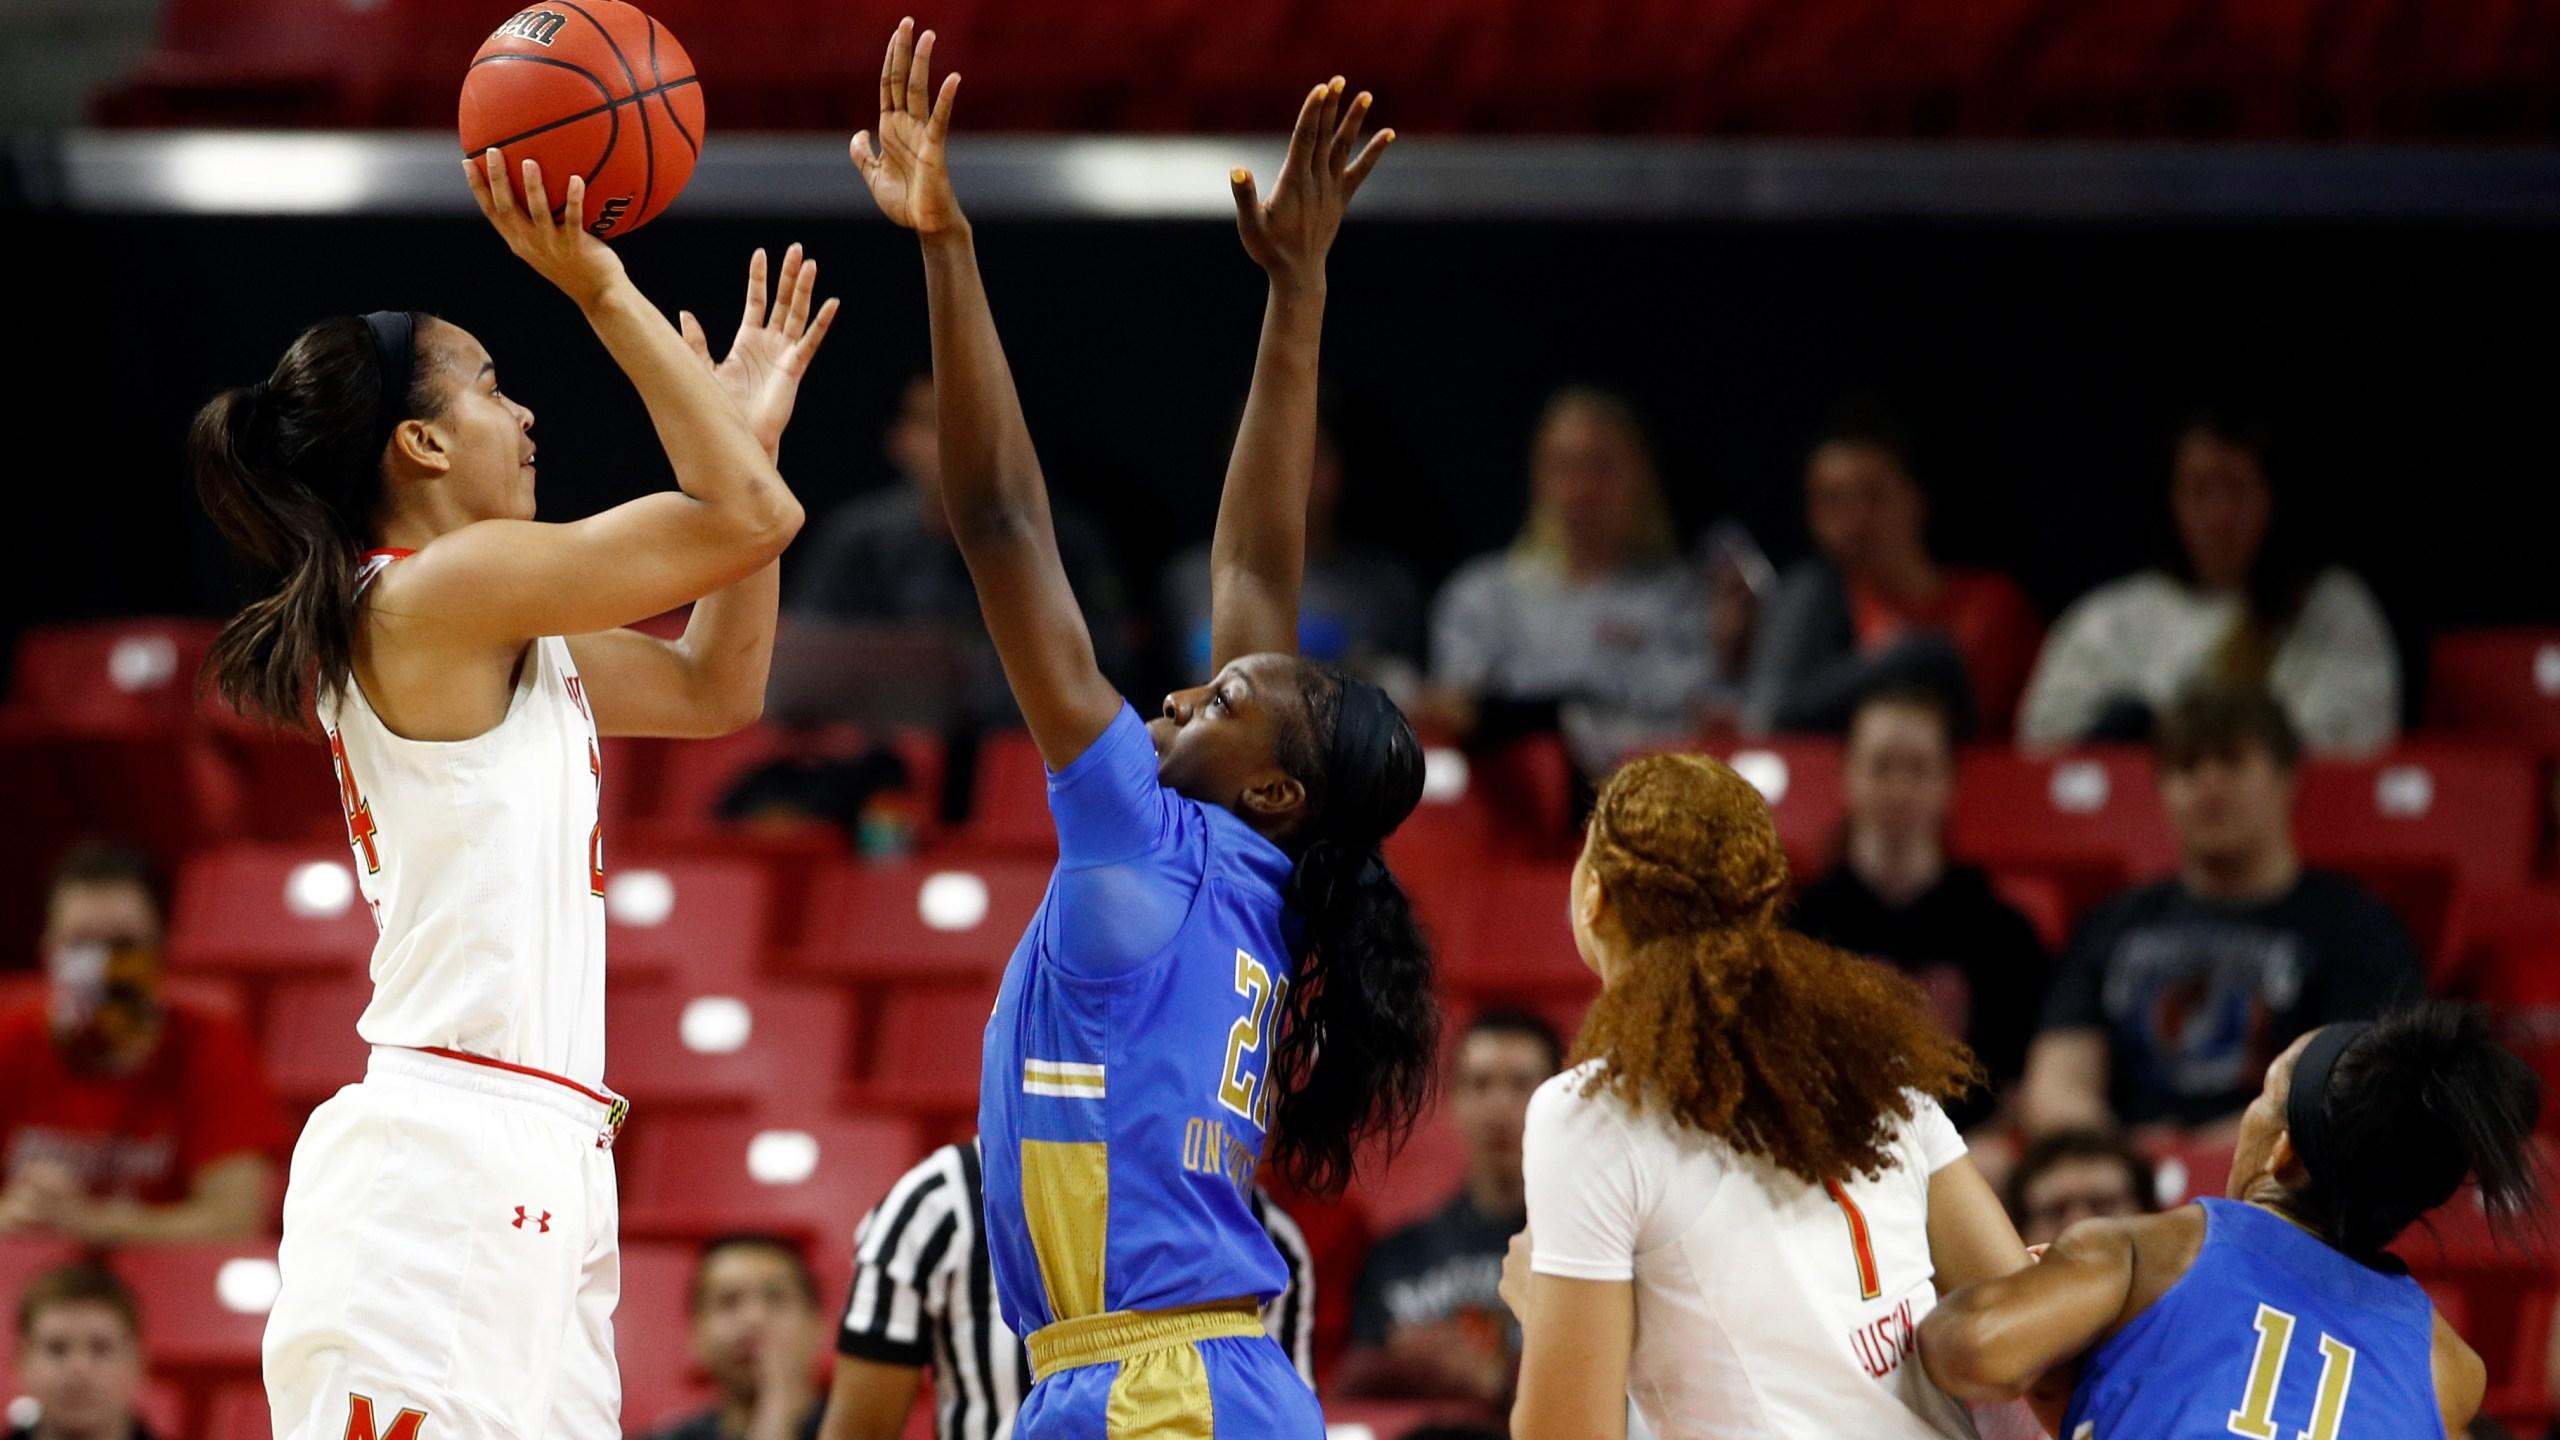 NCAA_UCLA_Maryland_Basketball_78737-159532.jpg81678007